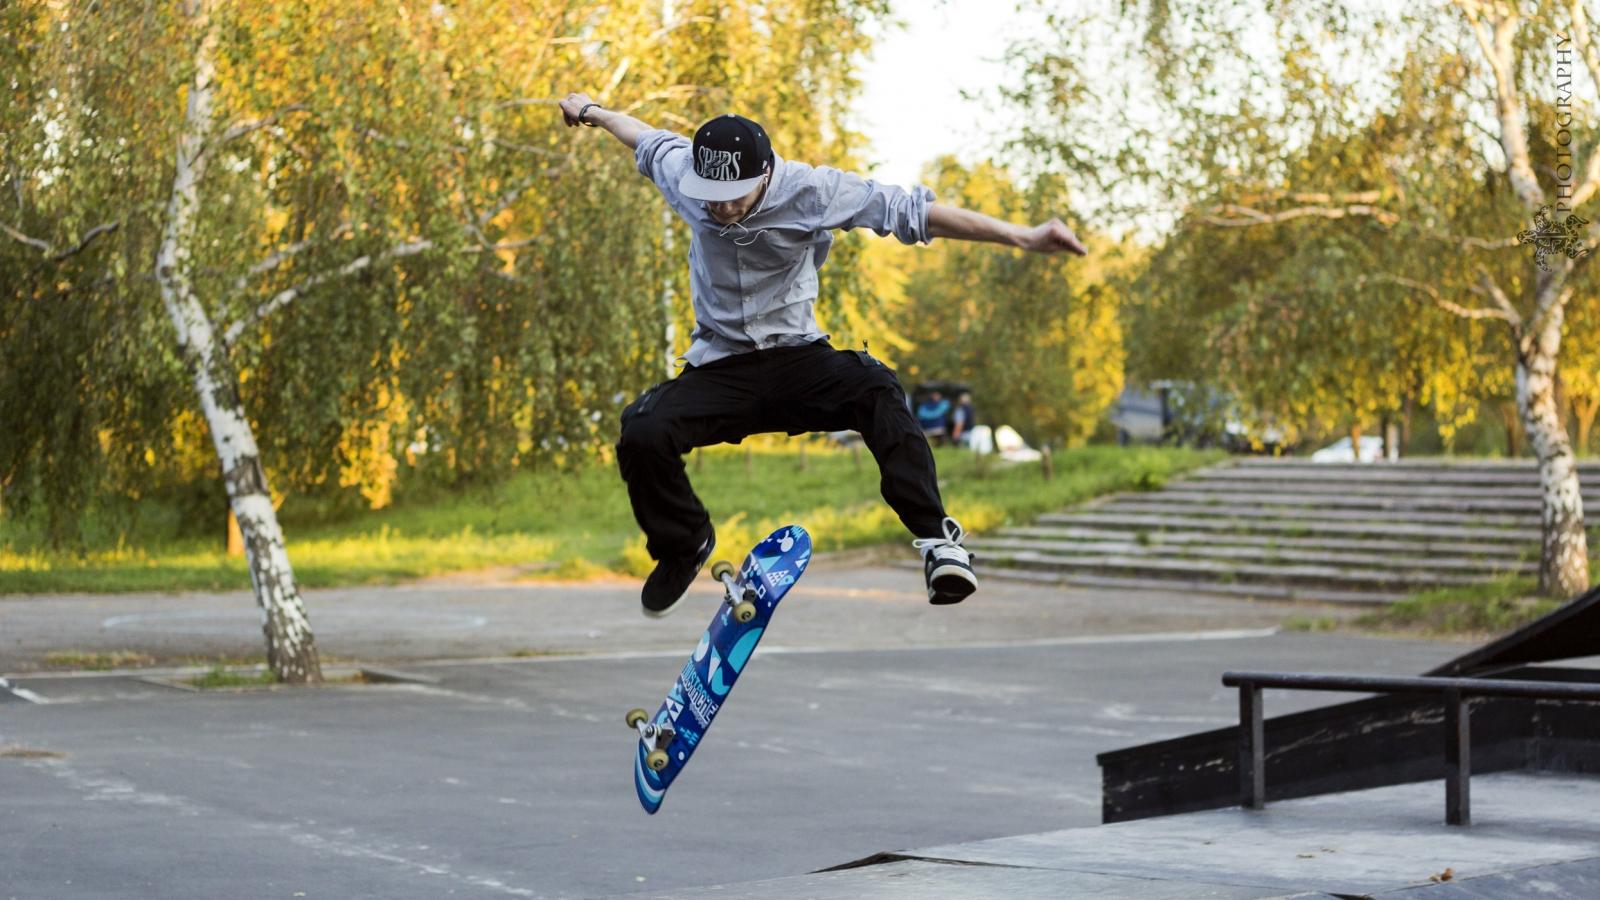 Trucos con skate - 1600x900